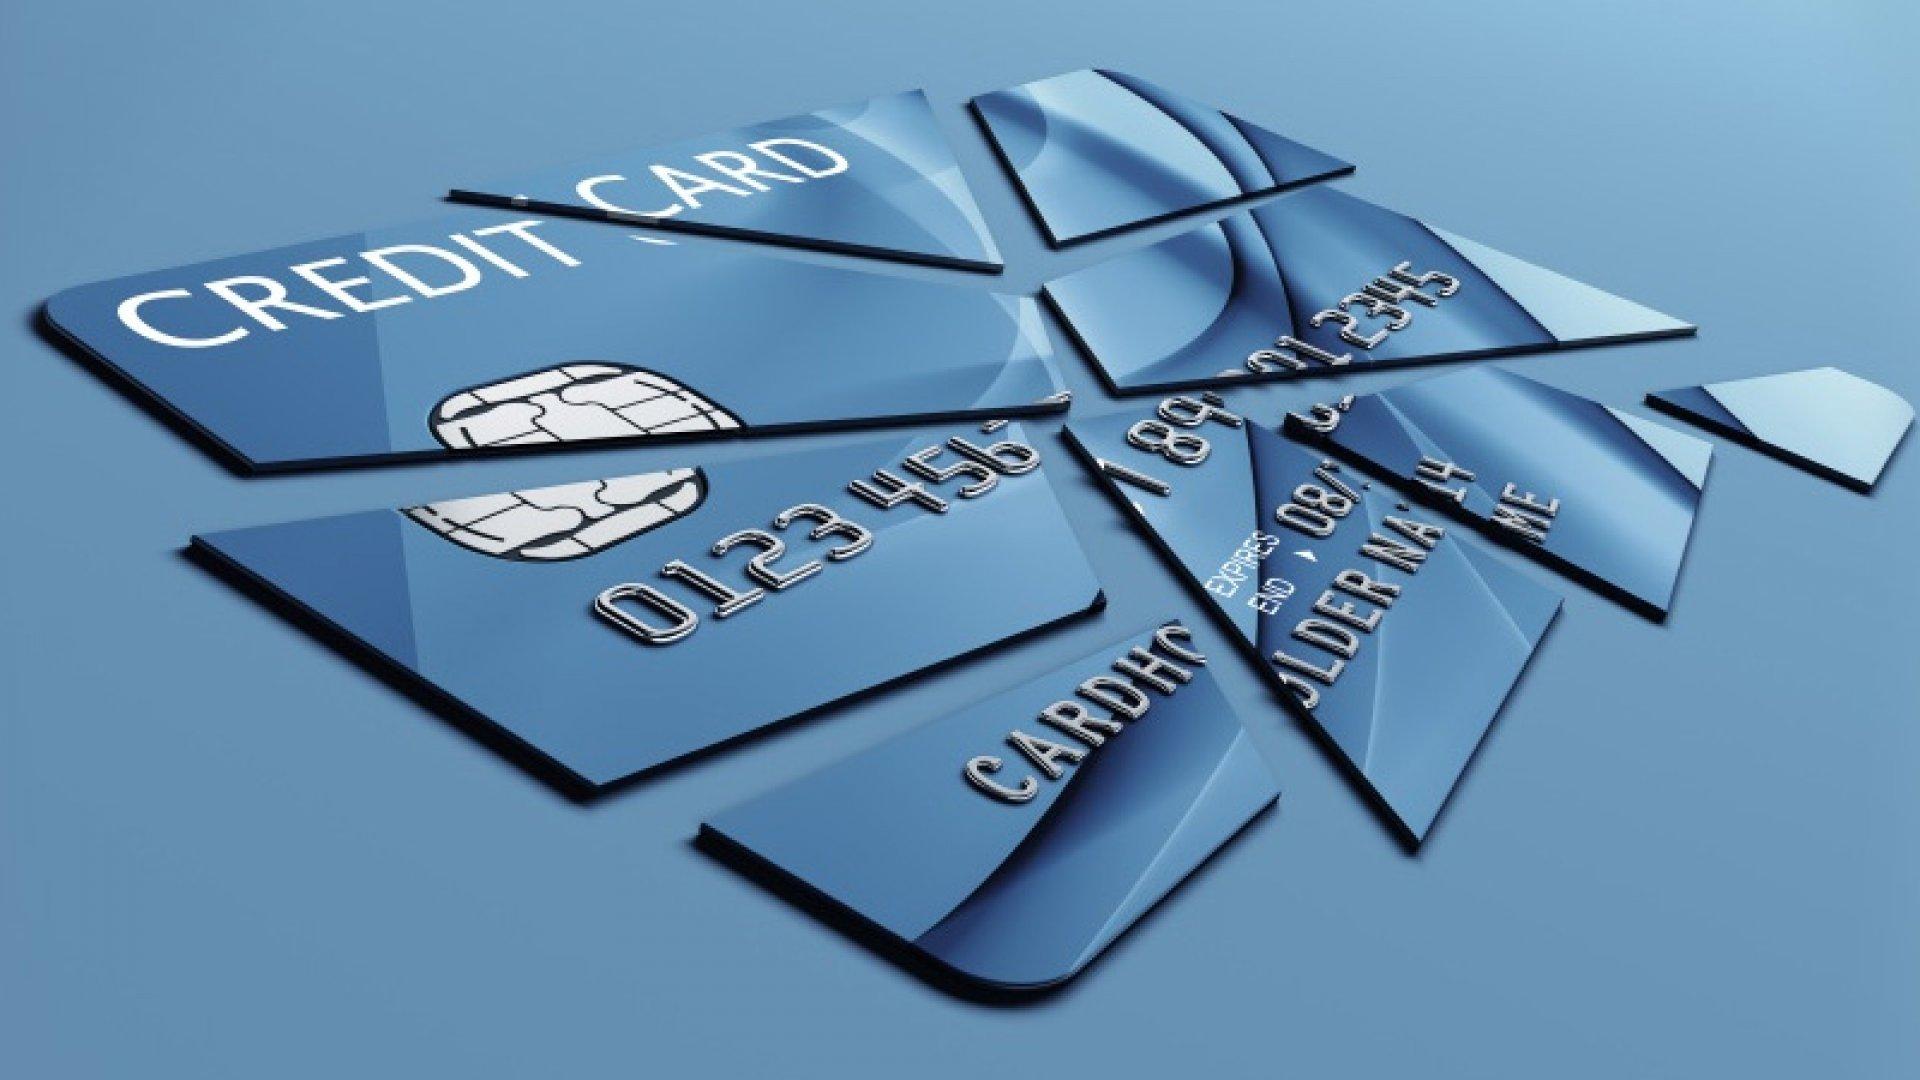 Retailers Beware: FBI Warns 2014 Will Bring More Data Breaches